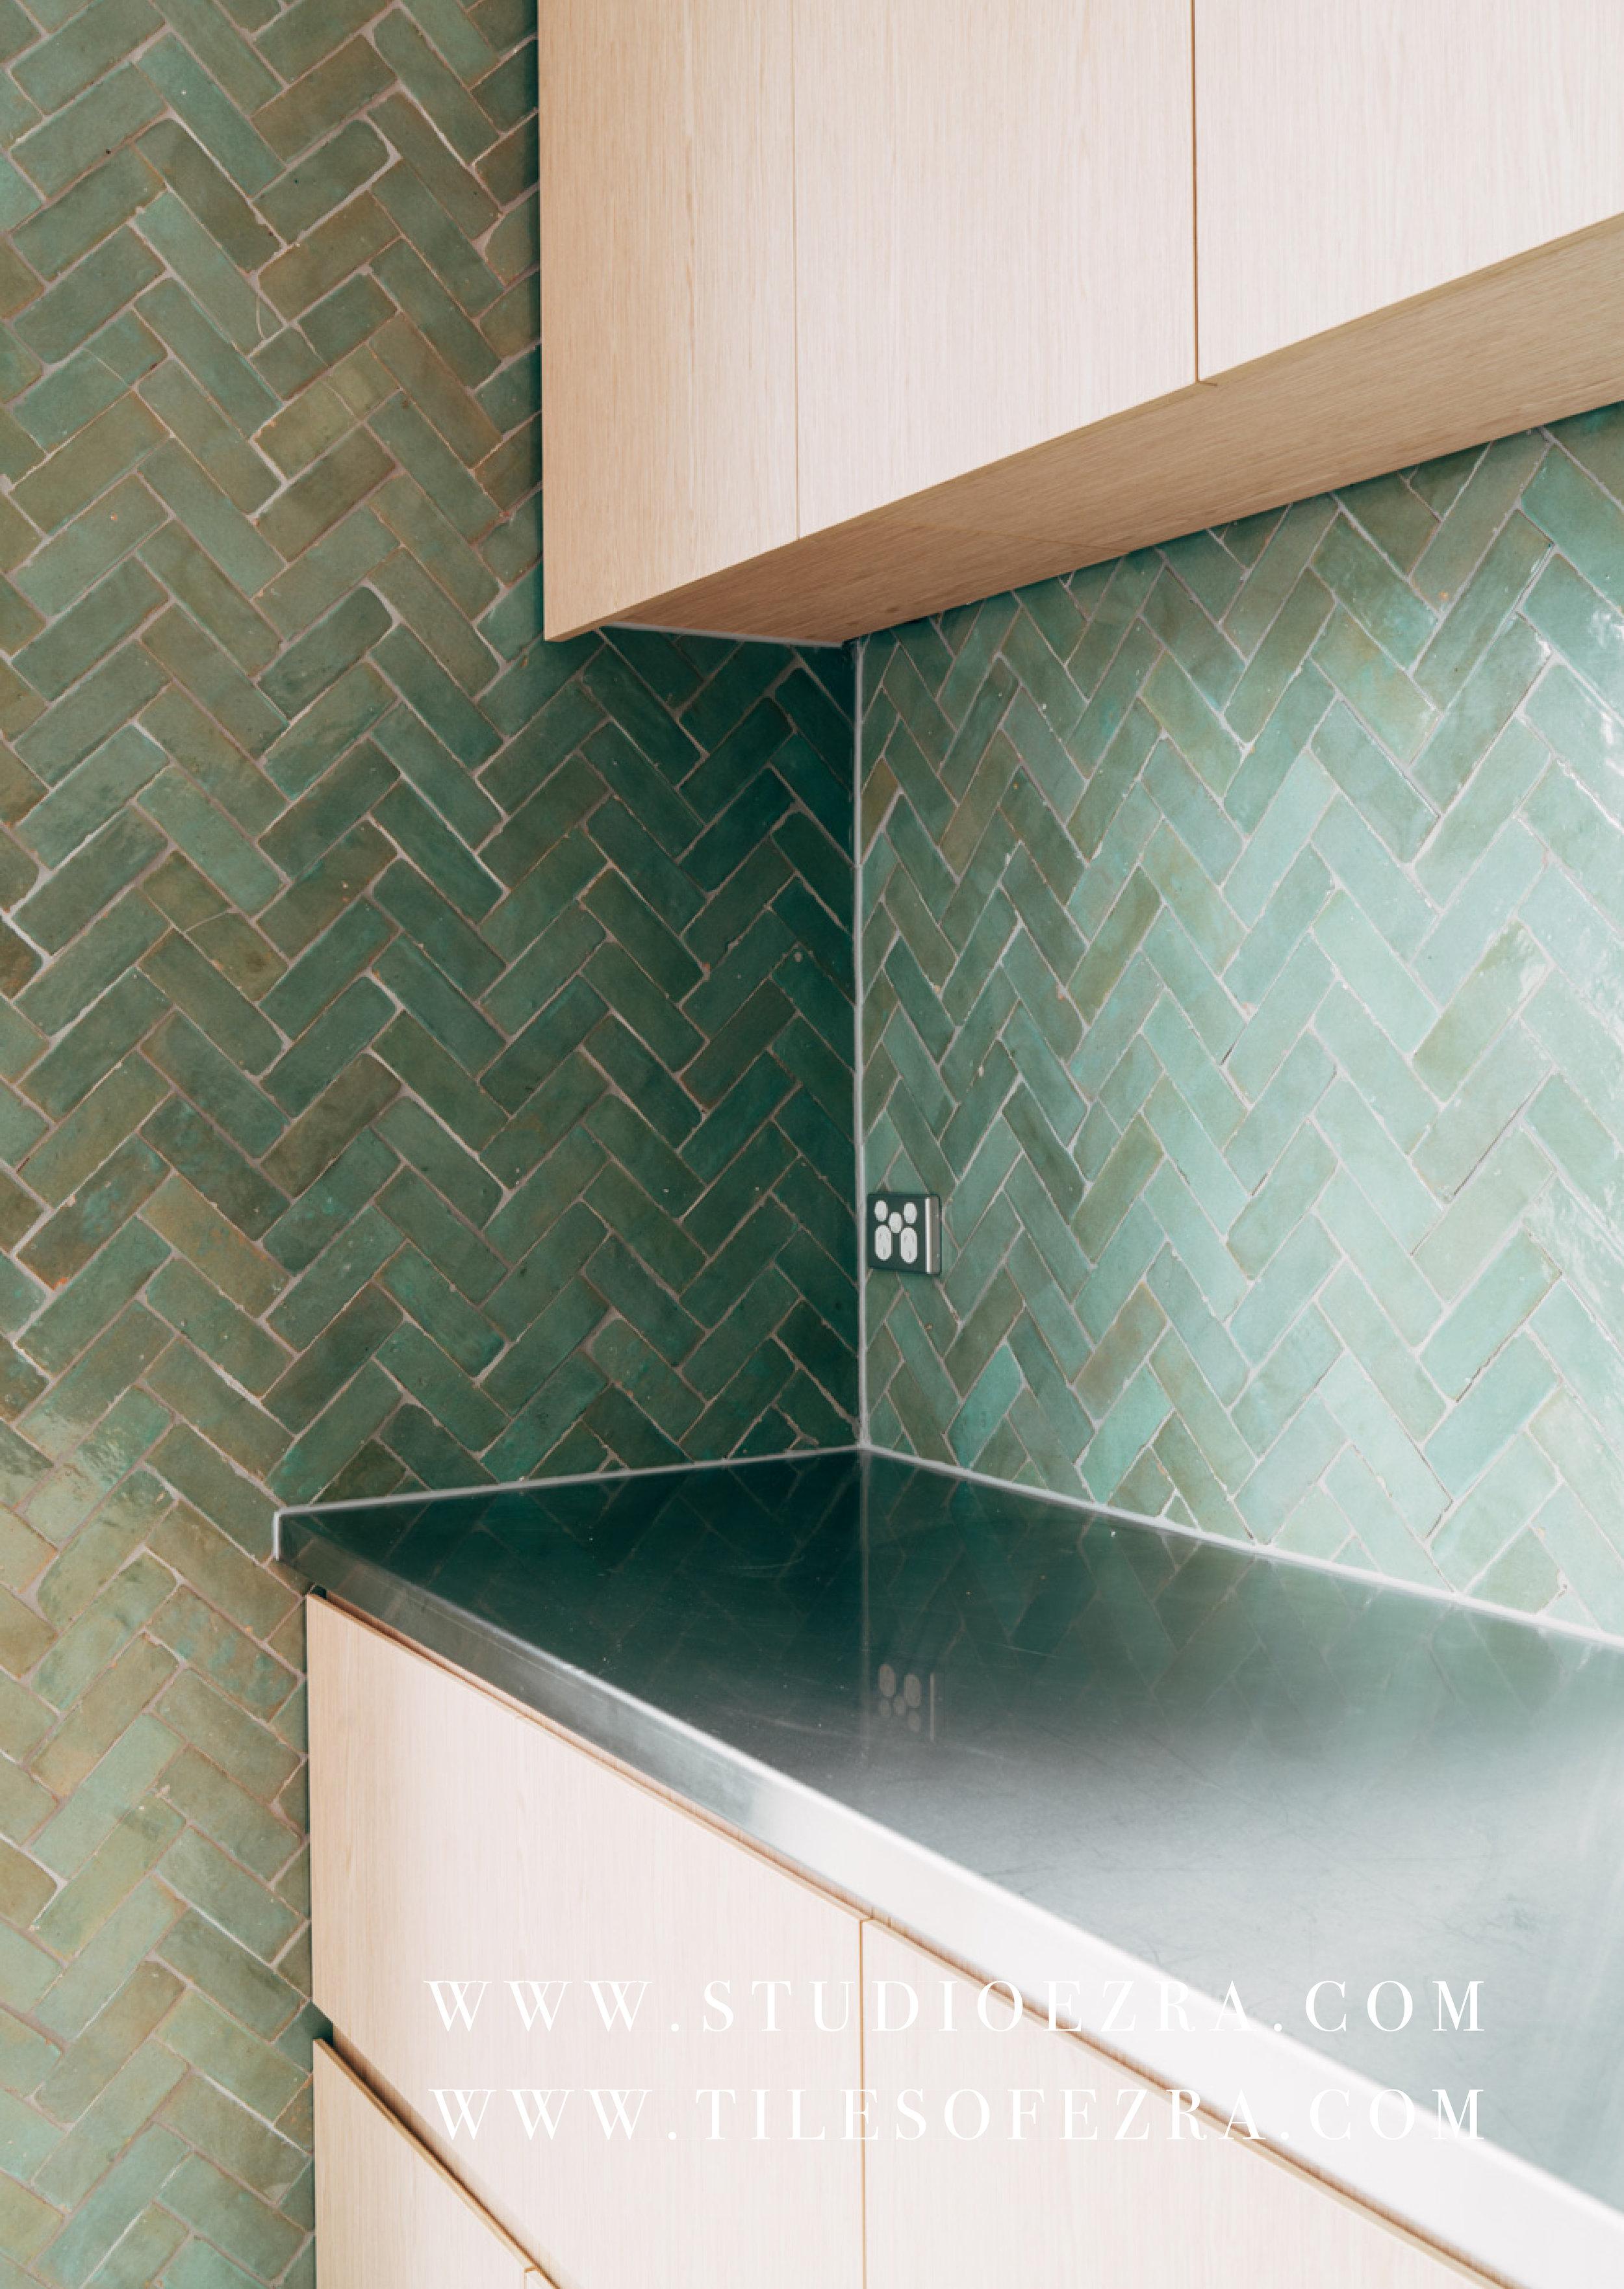 Studio Ezra design_Tiles of Ezra FL006 Aqua Moroccan Bejmat splashback c.jpg